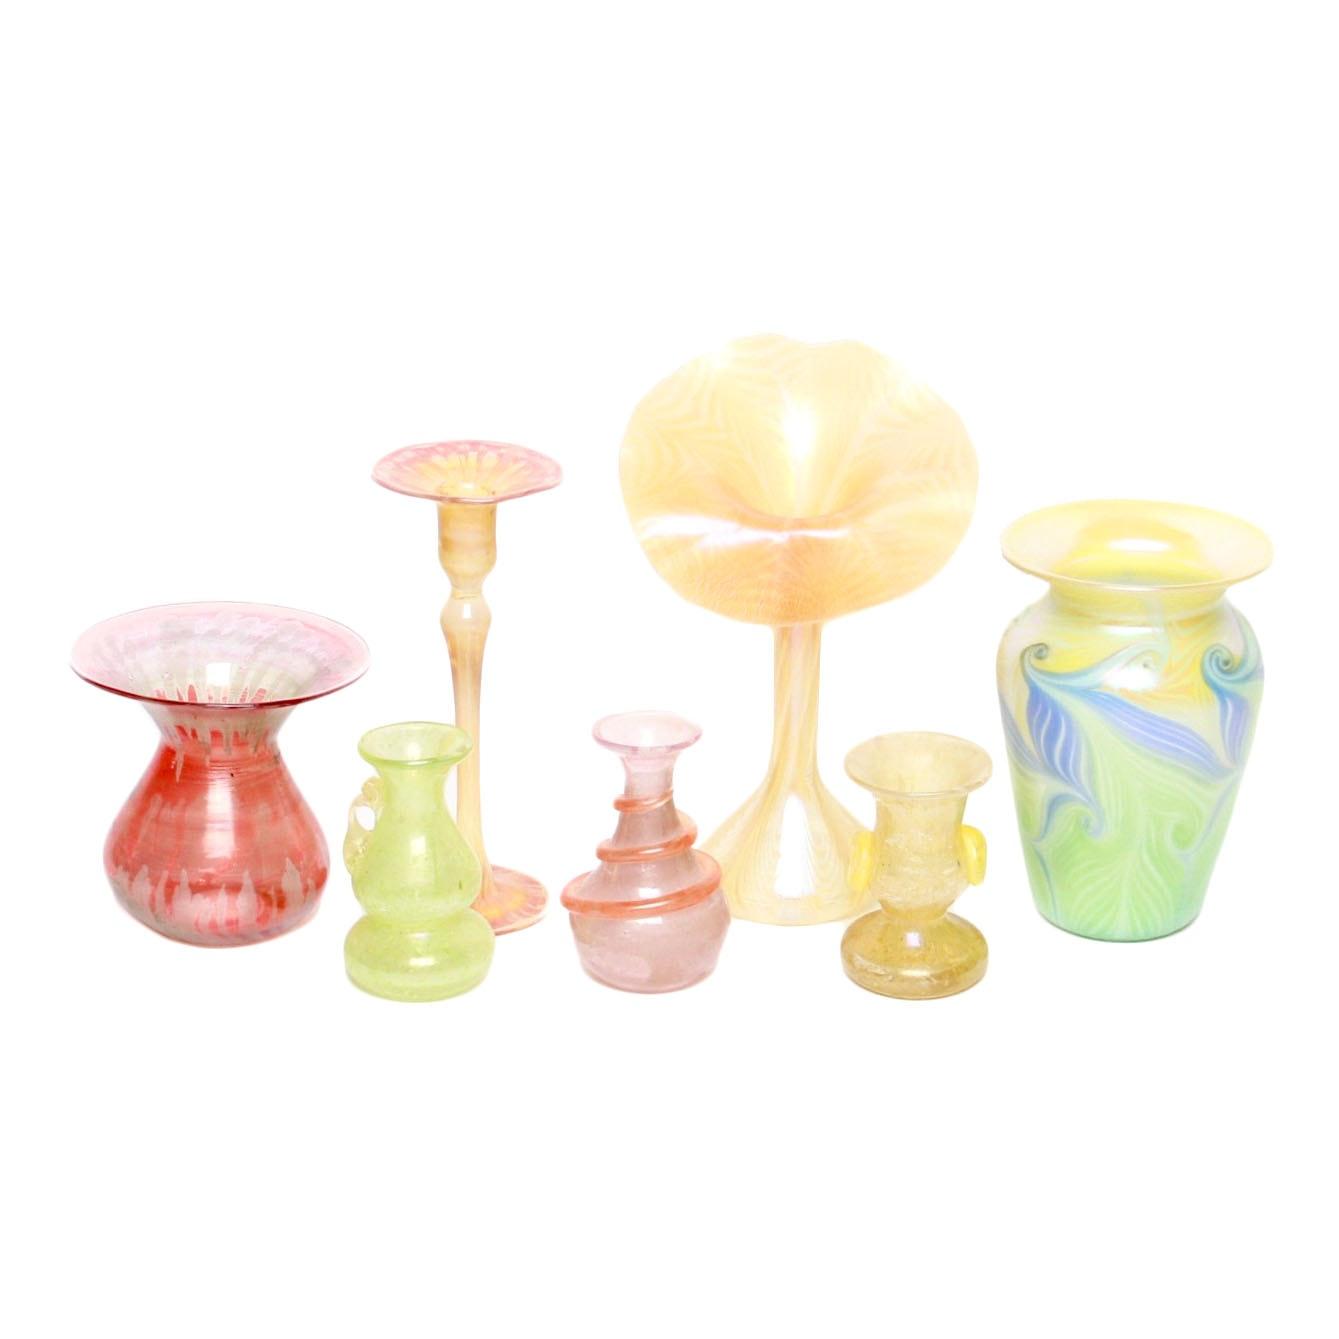 Iridescent Blown Glass Vases